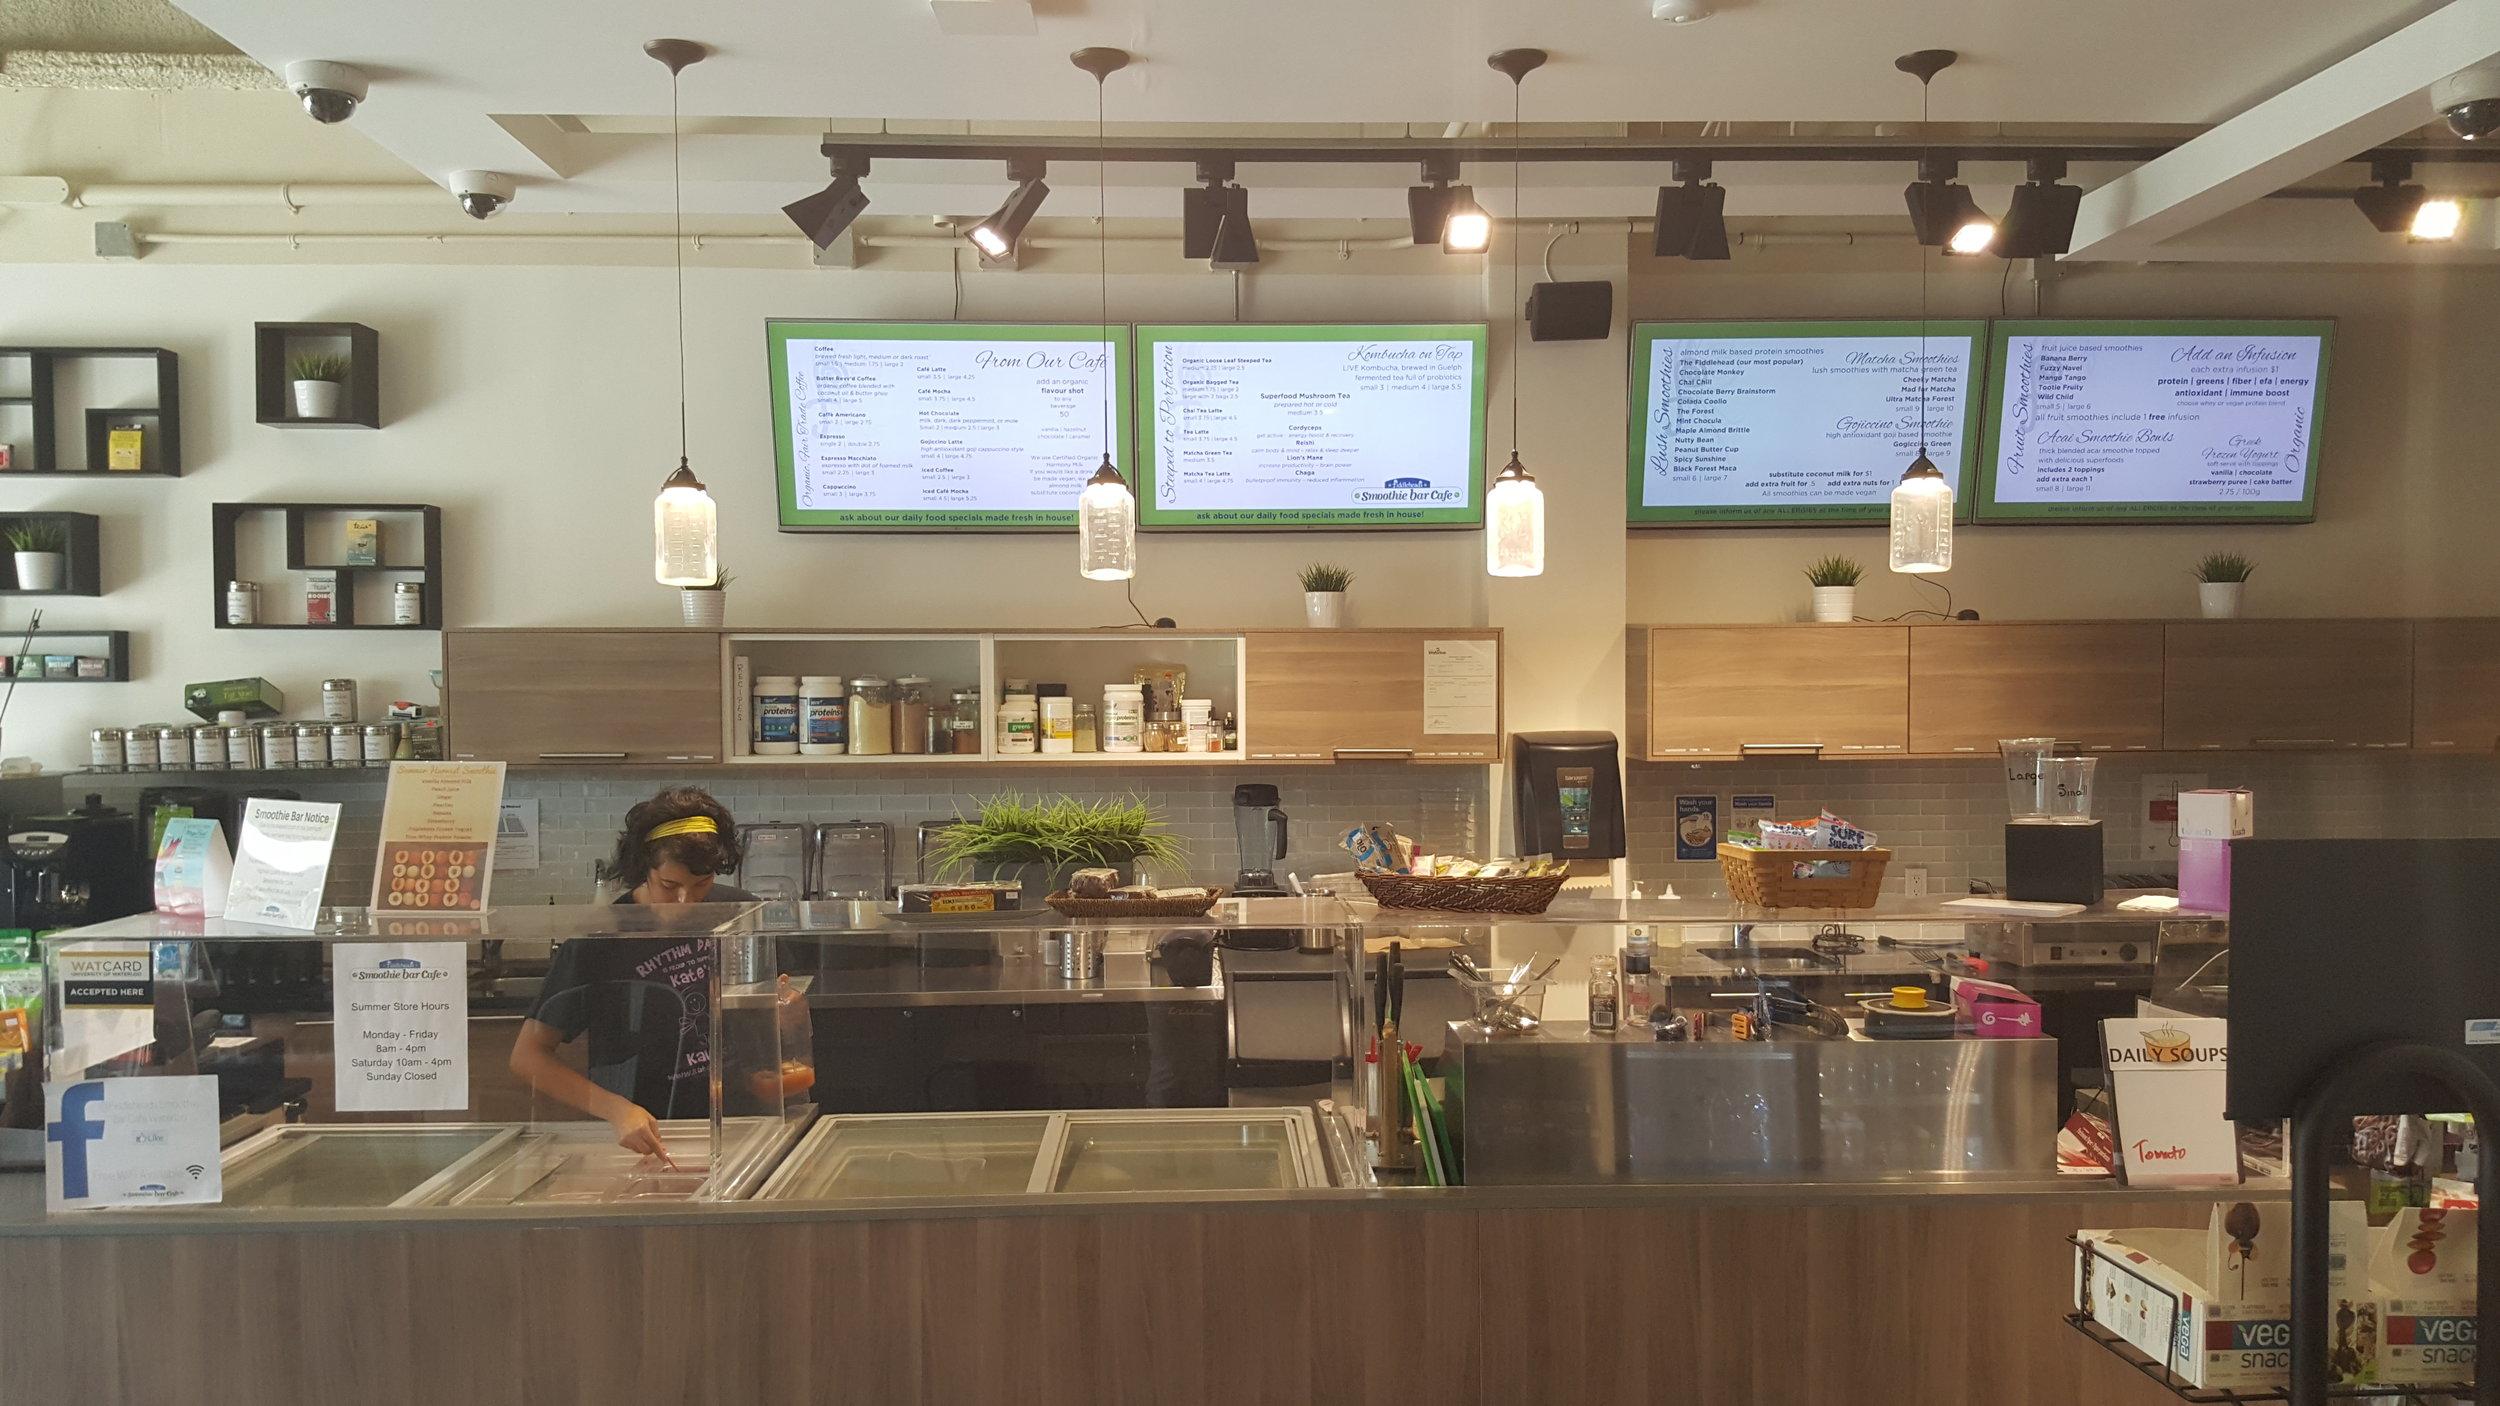 FIDDLEHEADS SMOOTHIE BAR CAFE